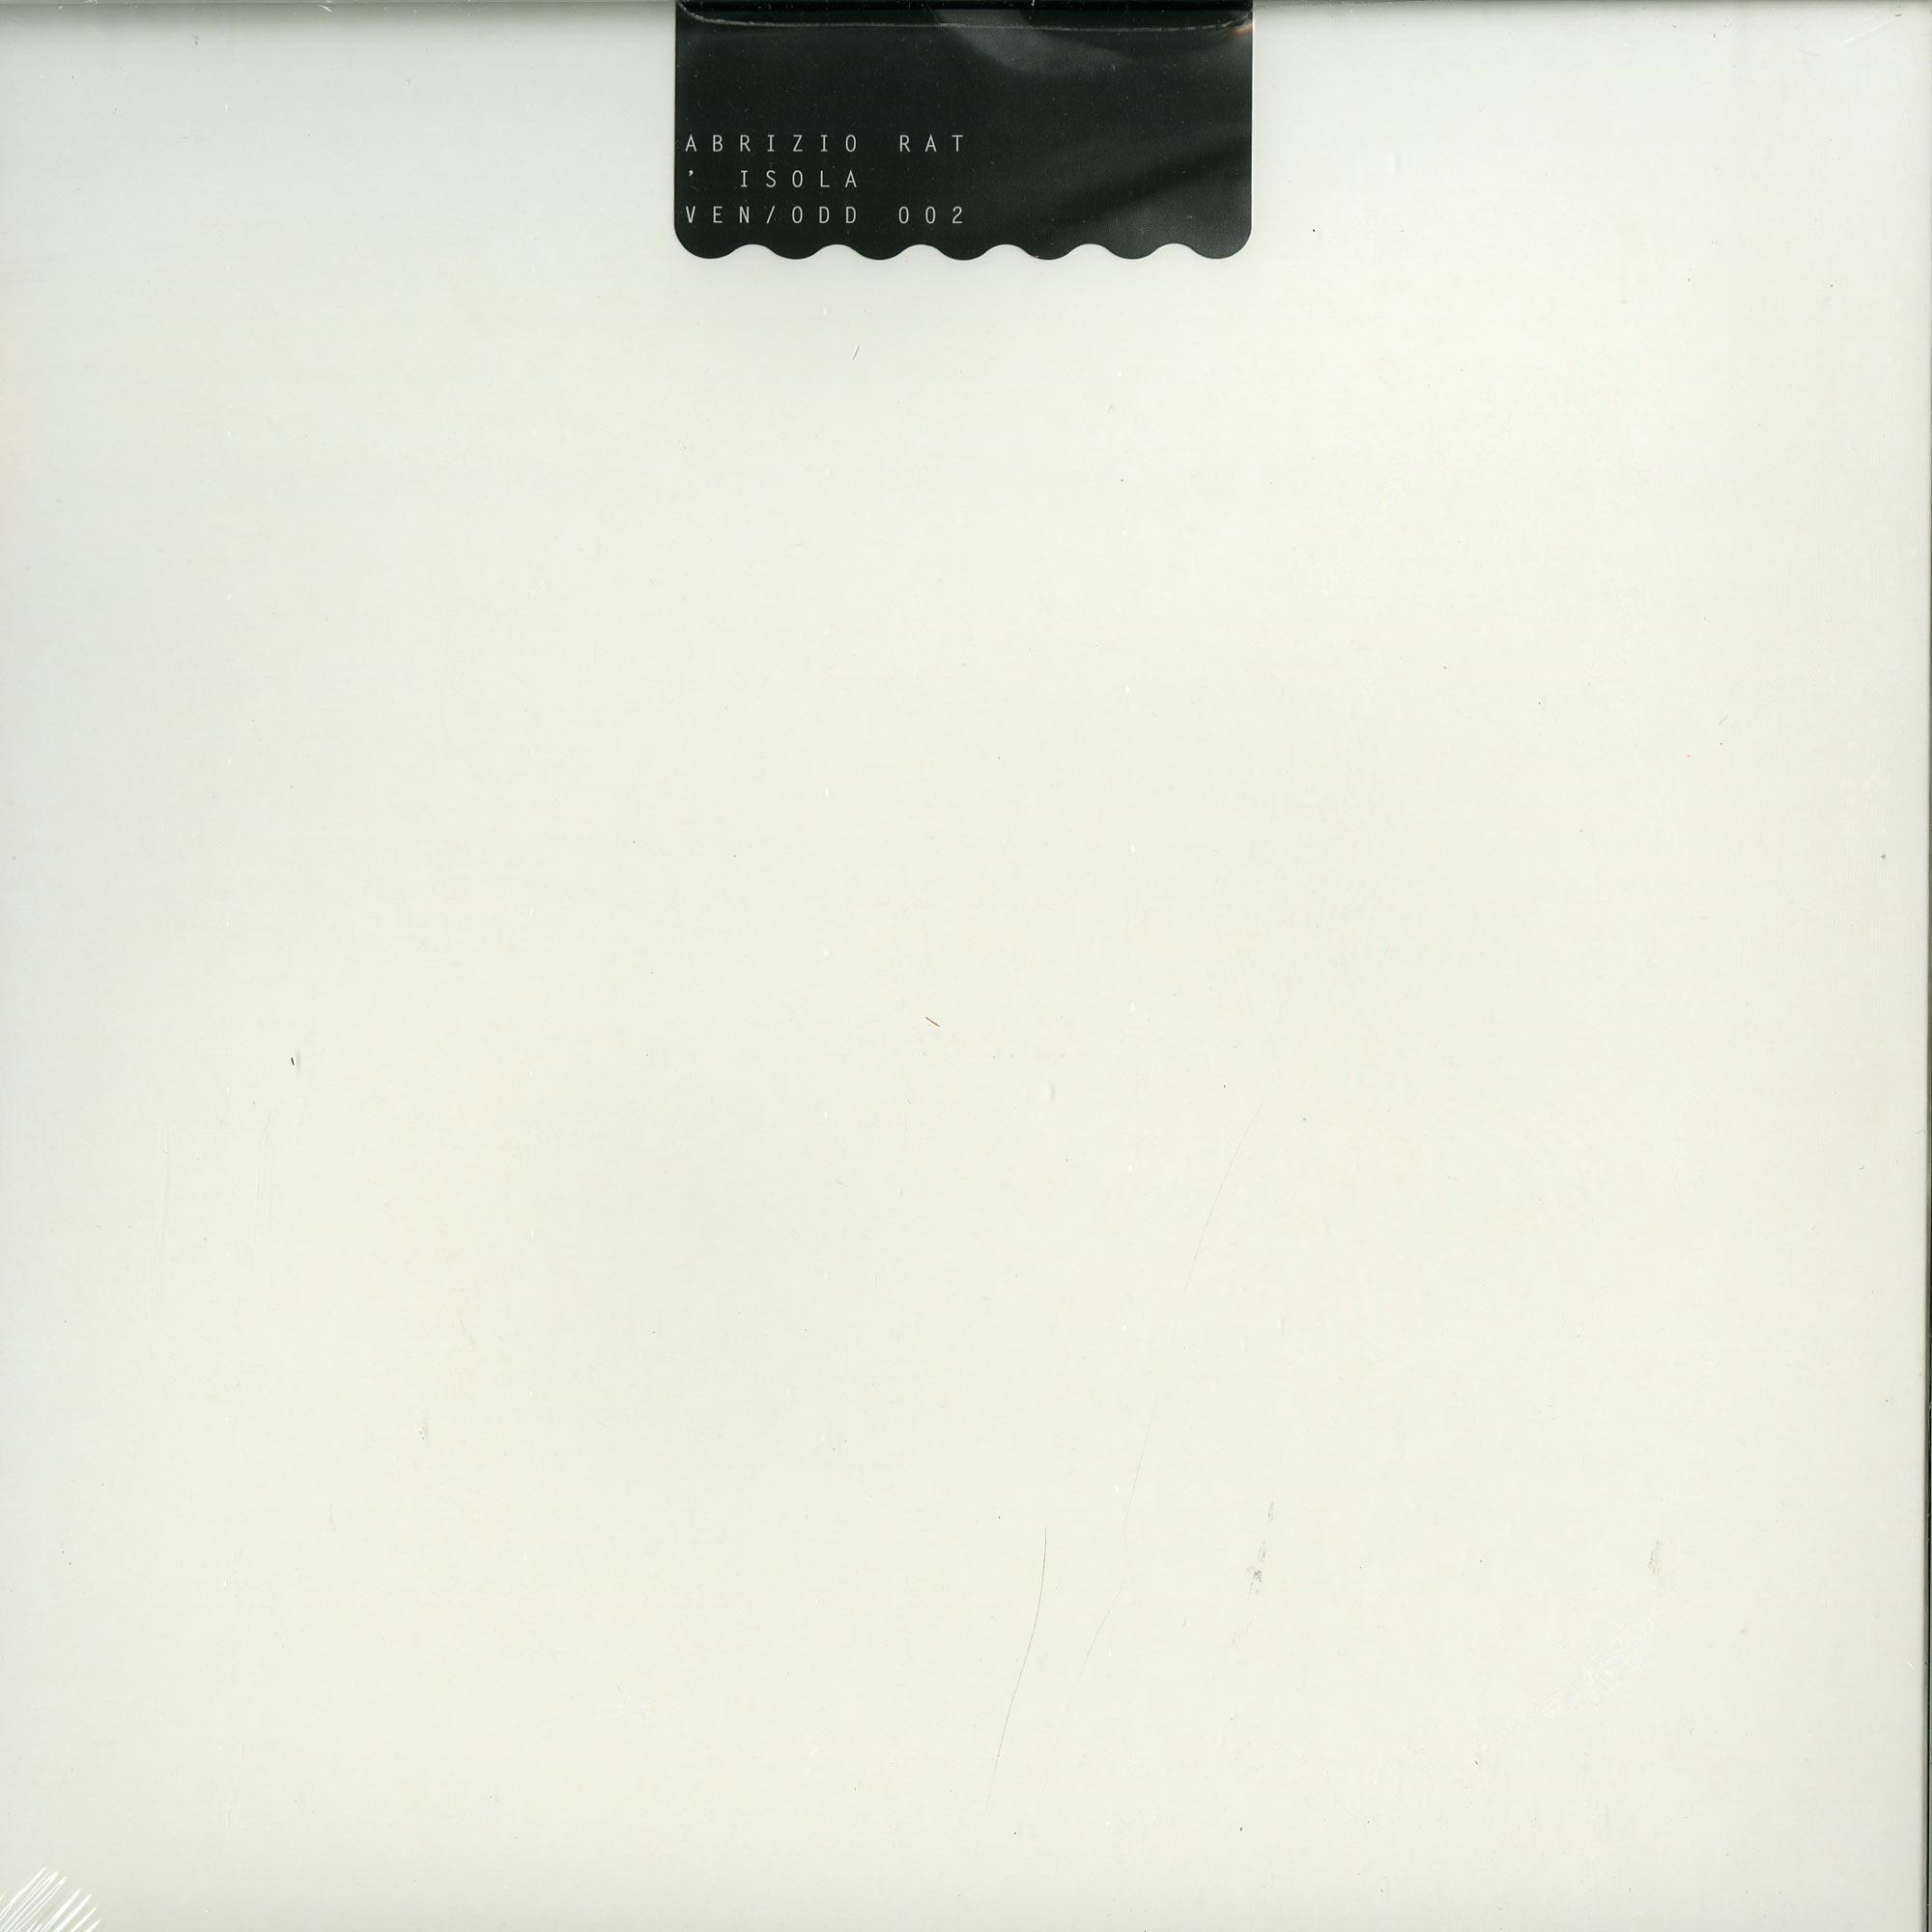 Fabrizio Rat - L ISOLA EP